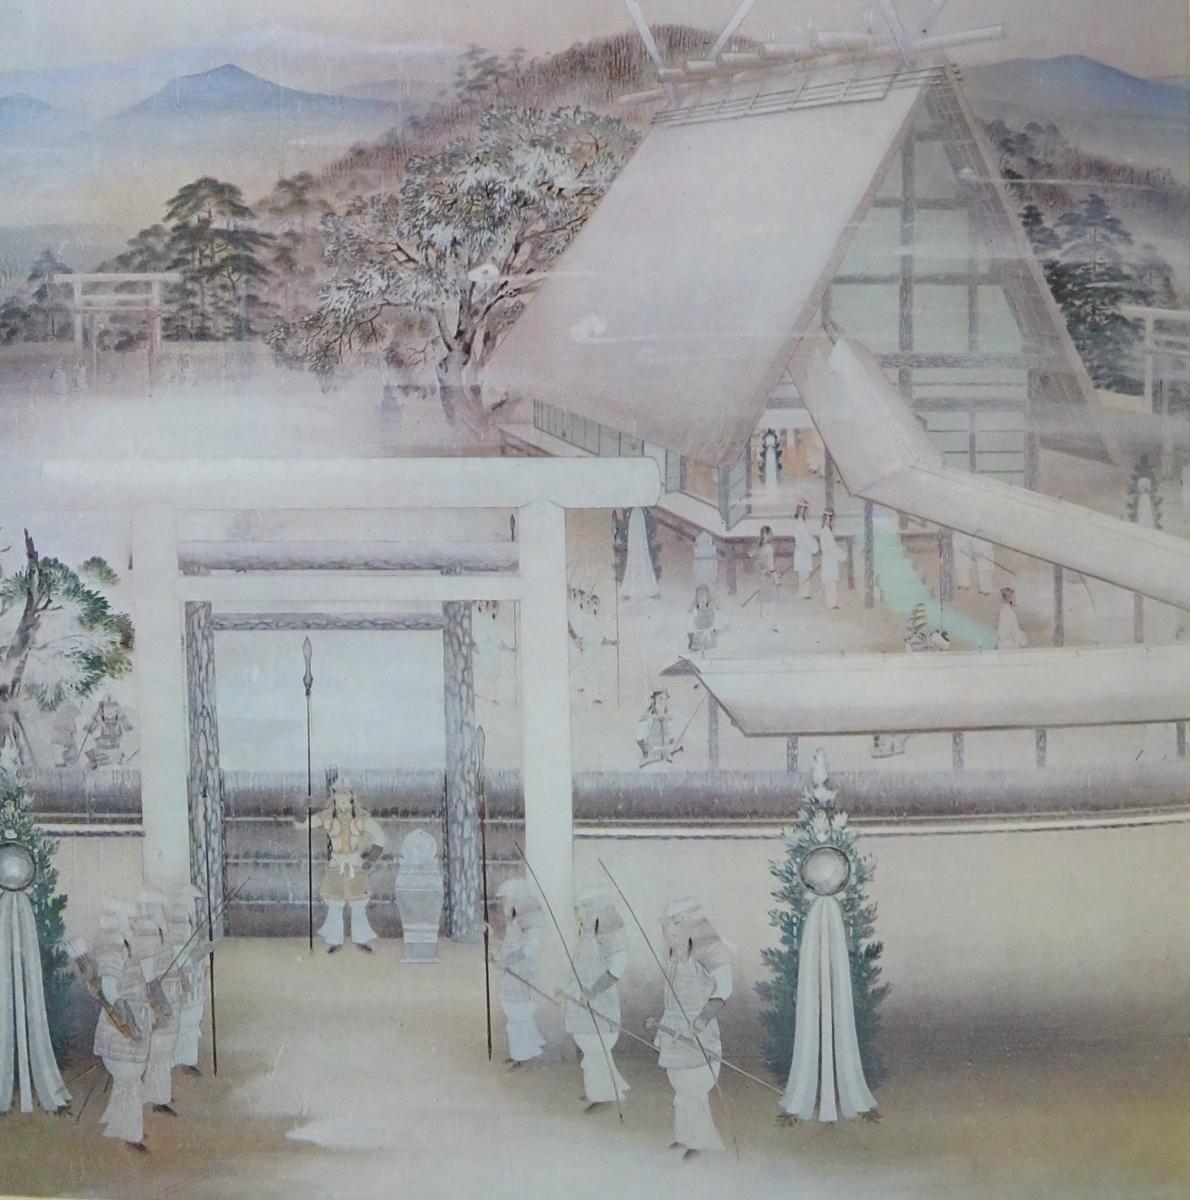 f:id:nakaimamarunosuke:20200607175716j:plain